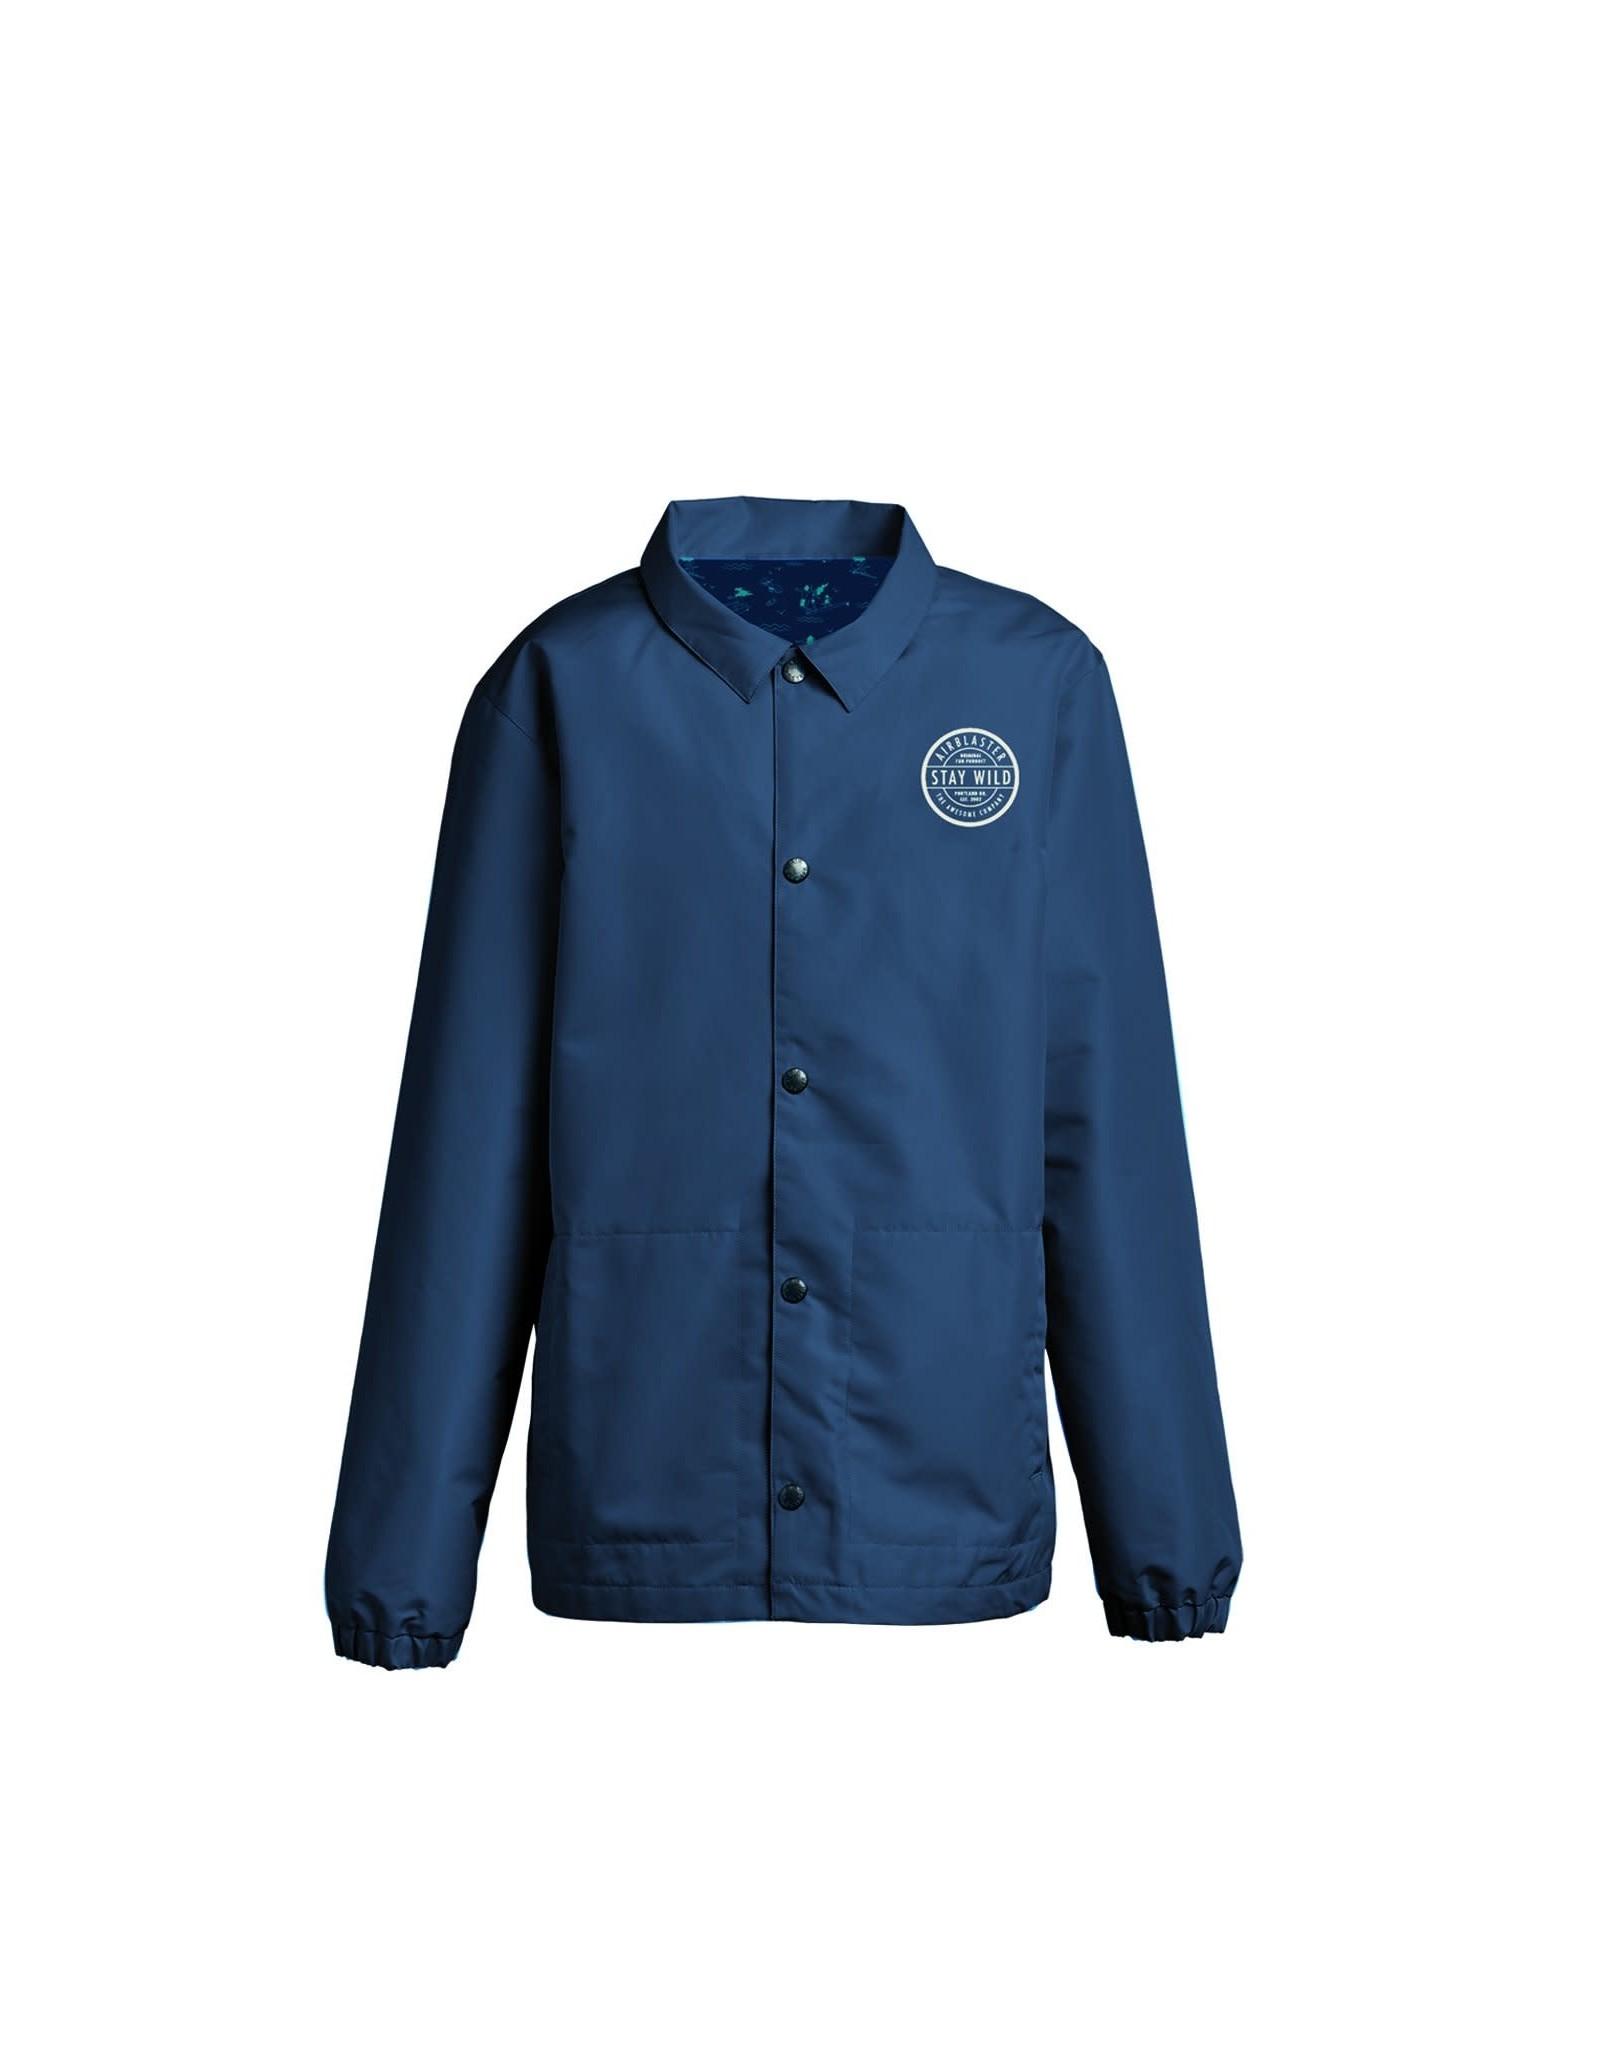 AIRBLASTER Bruiser Jacket